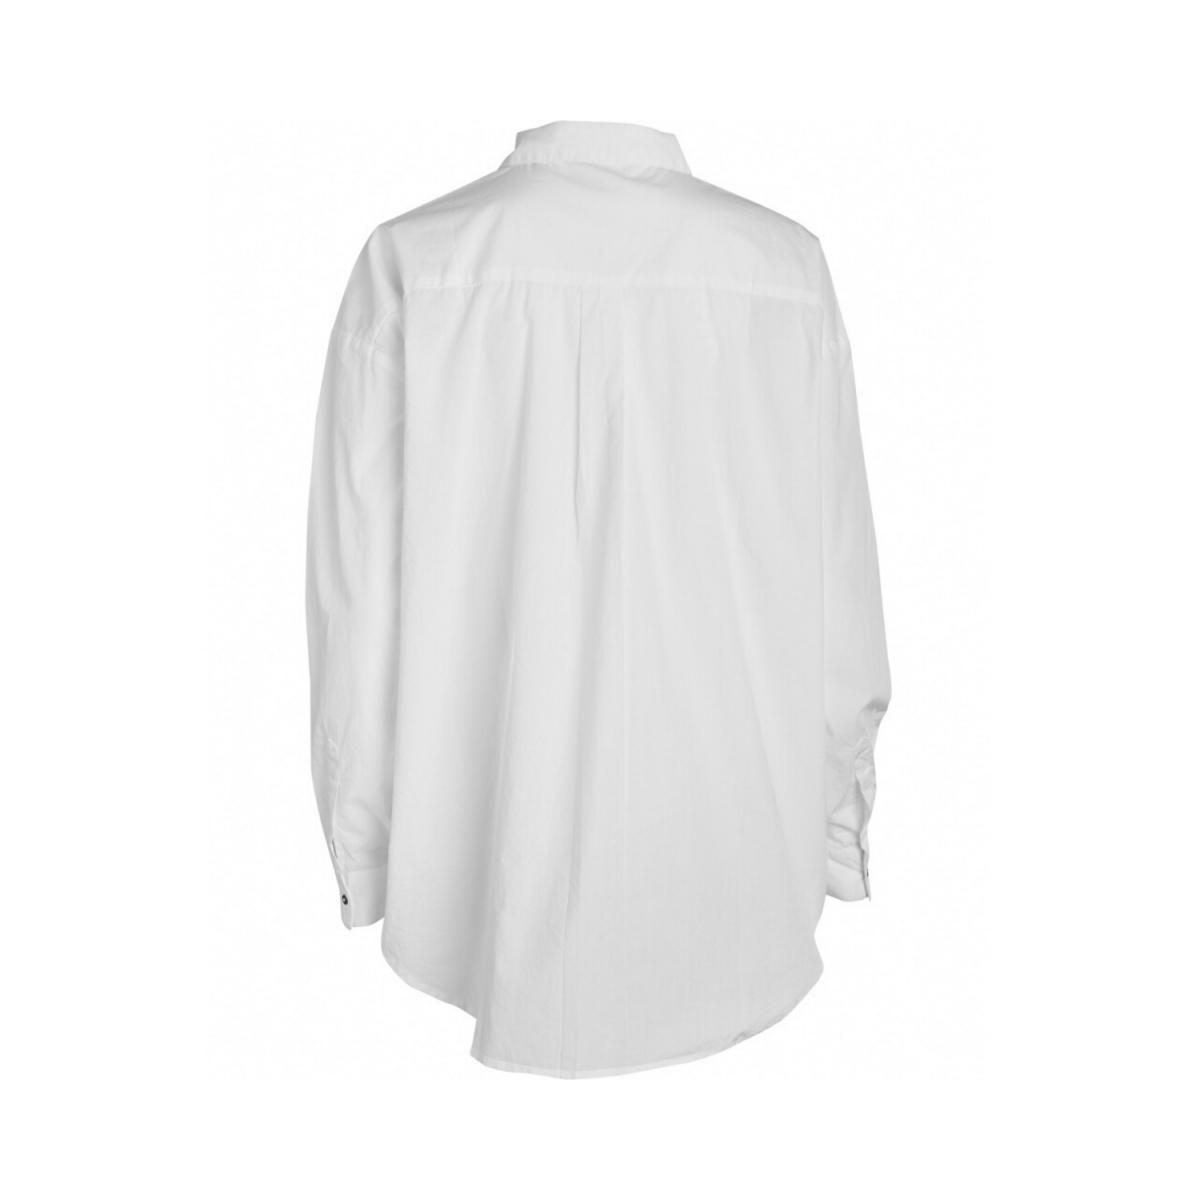 shanta shirt - white - ryggen